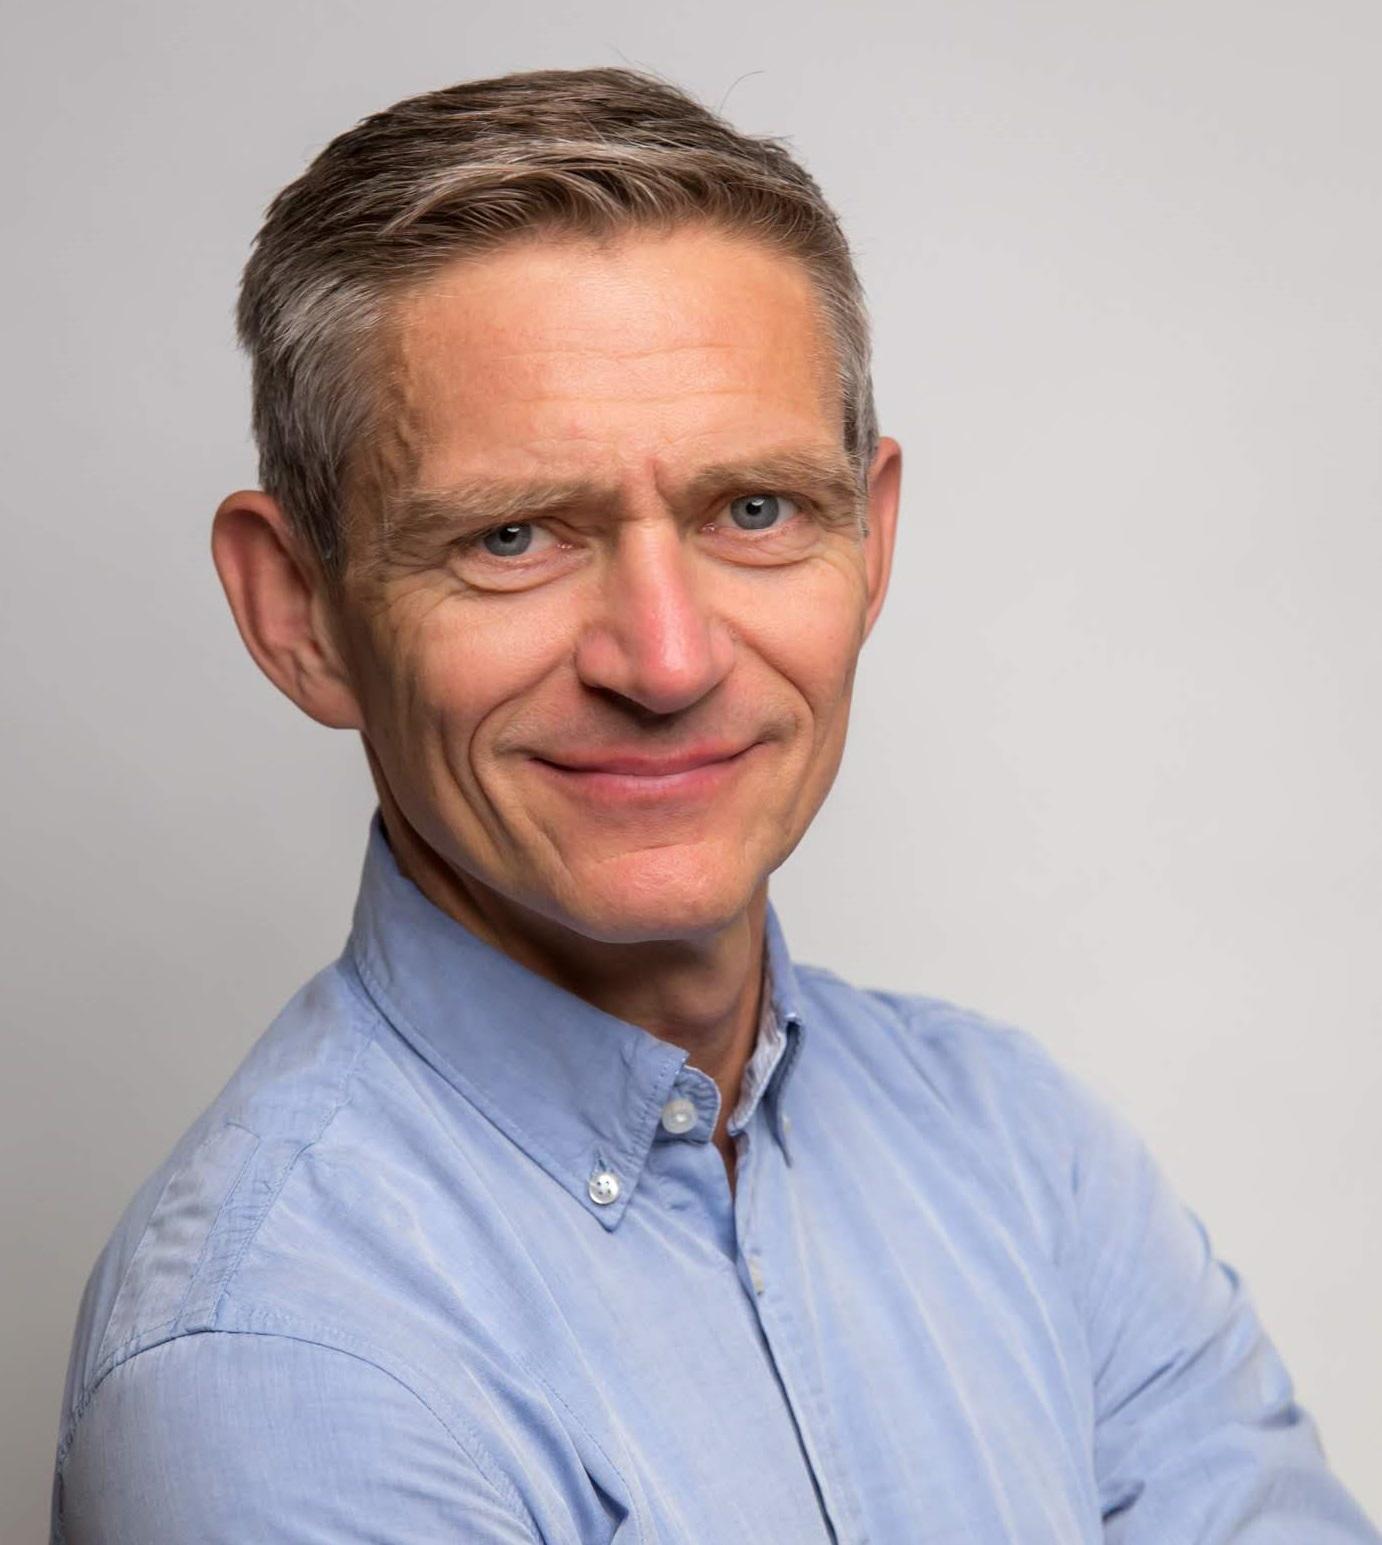 Mark Schwarzkopf